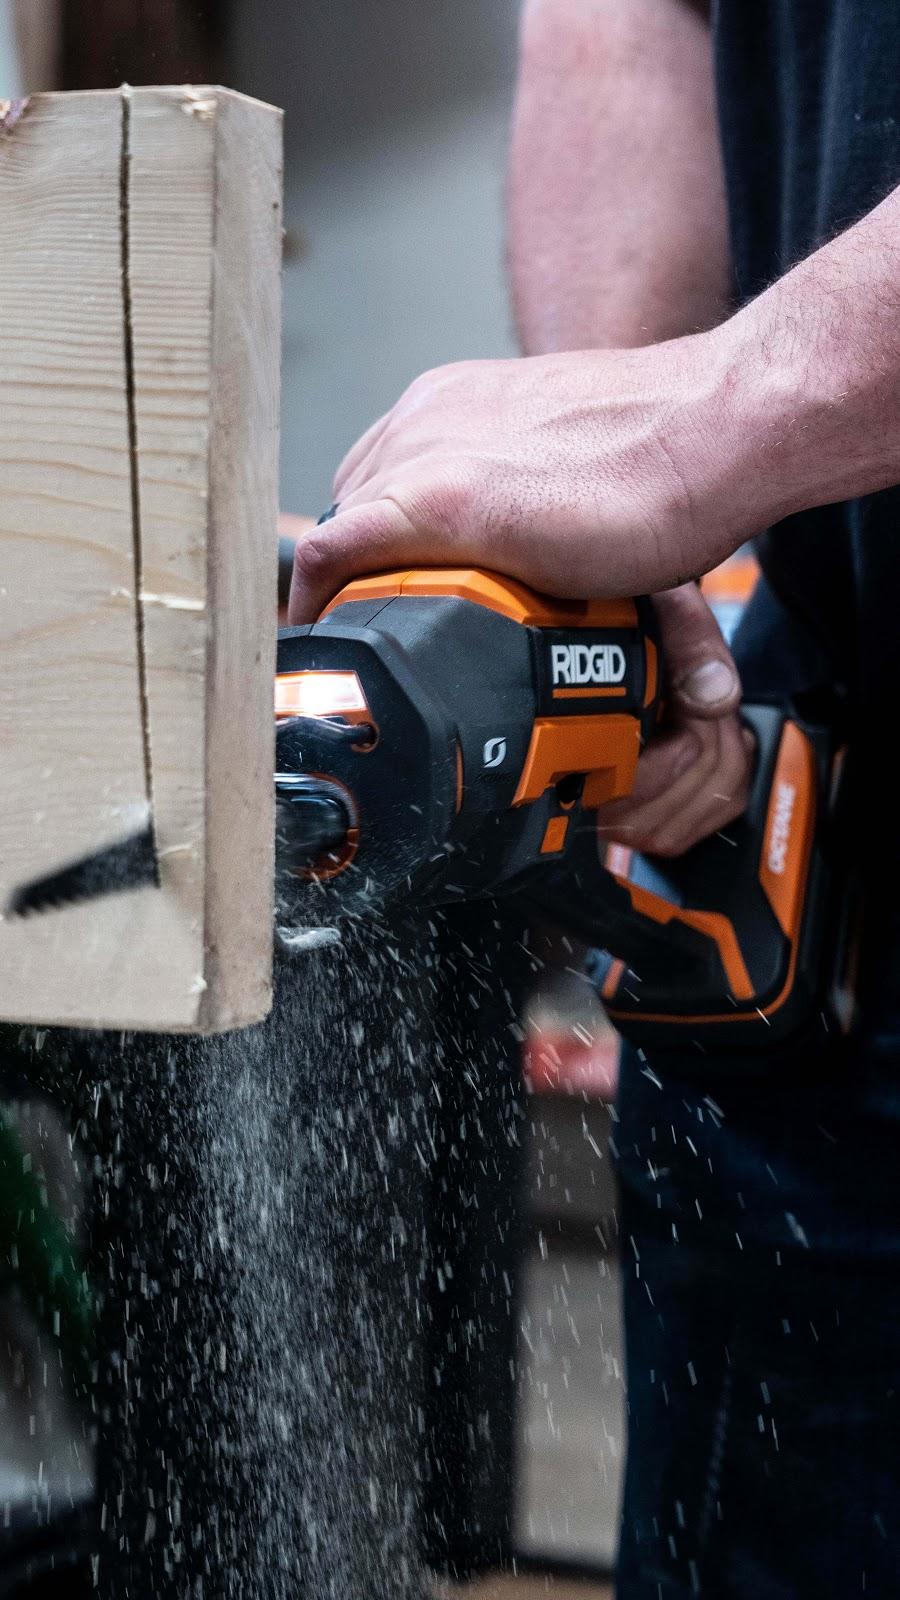 Cutting wood with RIDGID OCTANE saw